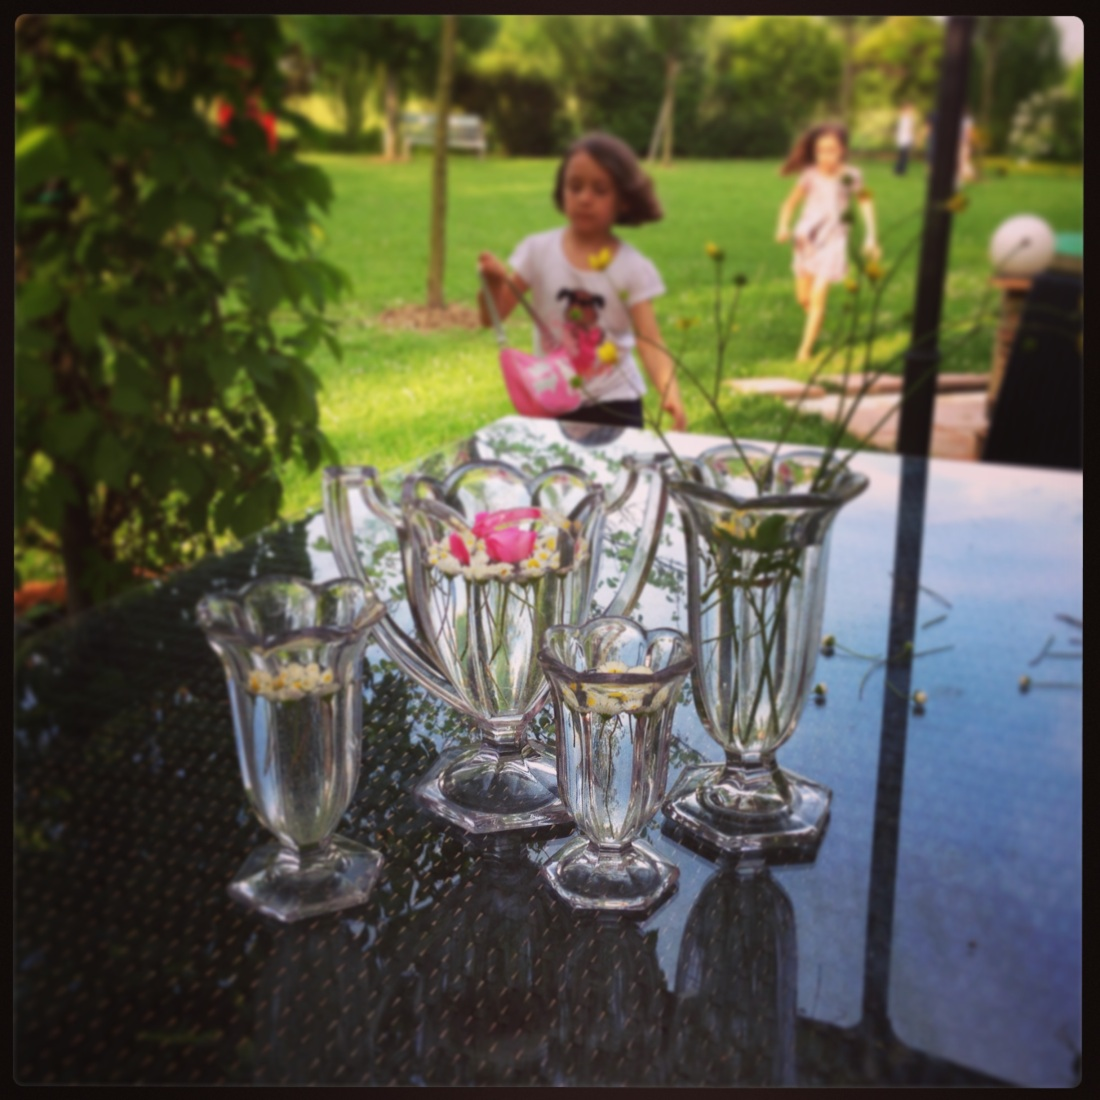 Glasses, Garden, Flowers and Girls